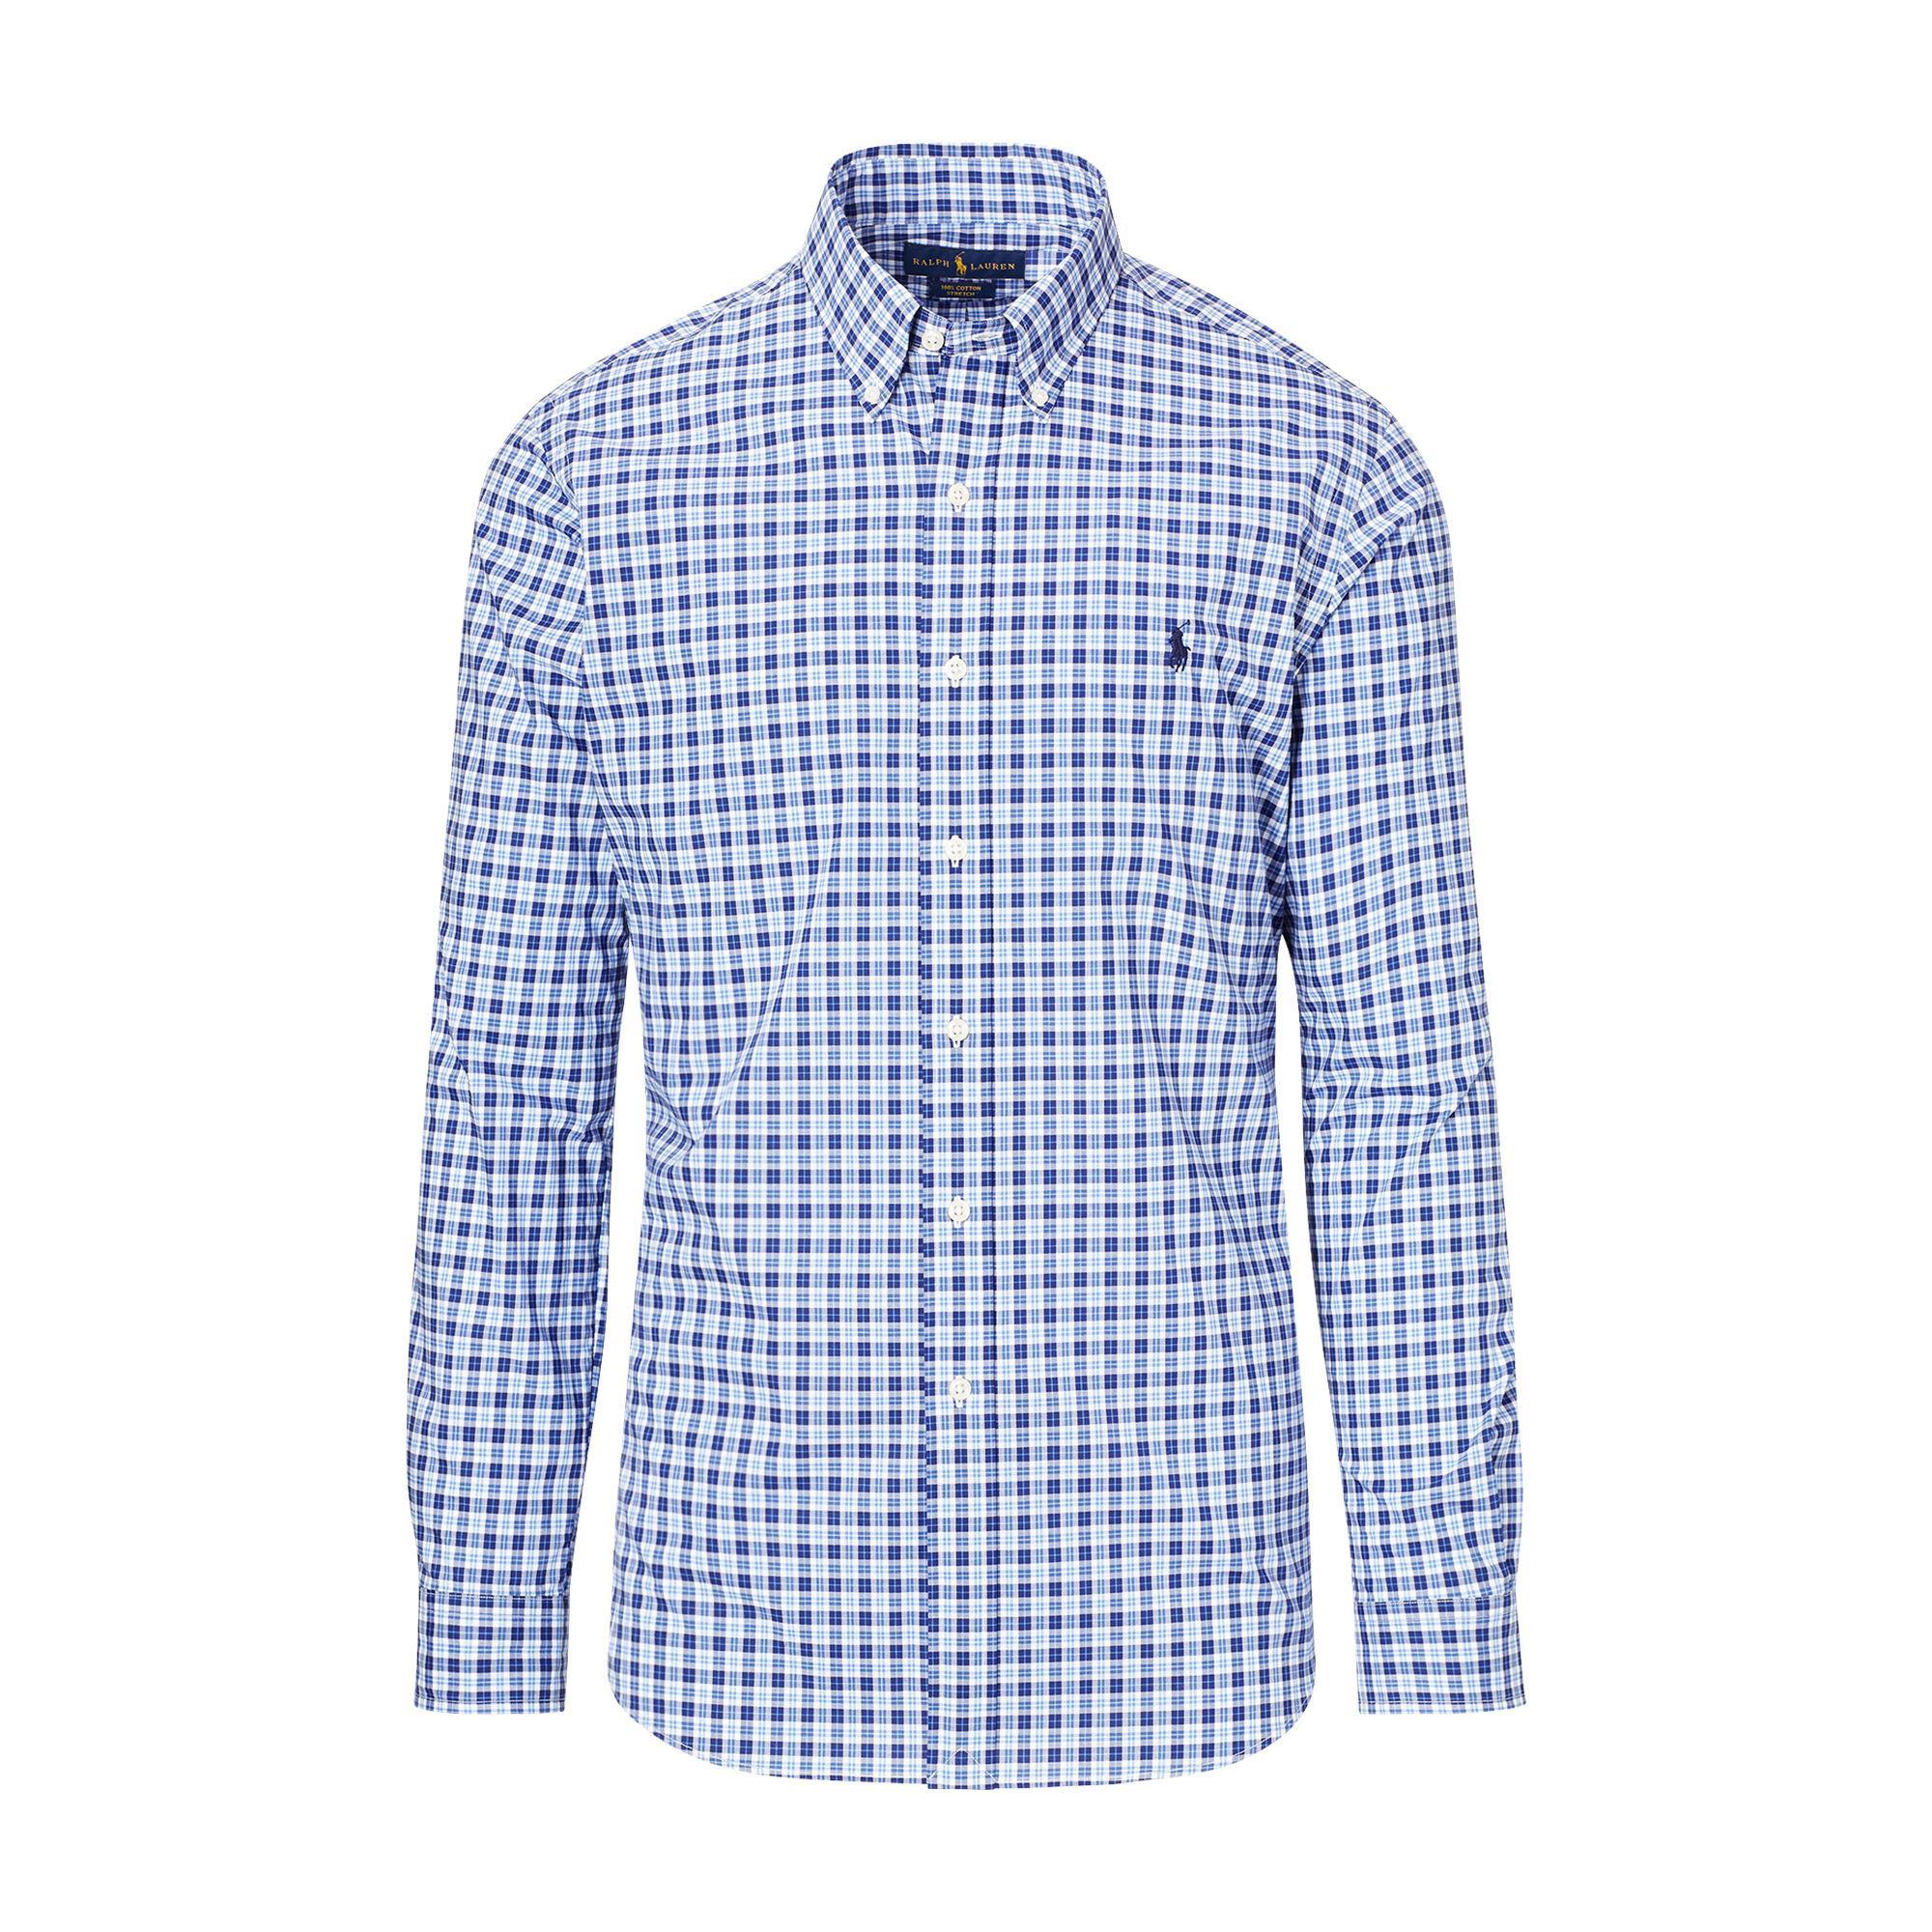 lyst pink pony plaid cotton poplin shirt in blue for men. Black Bedroom Furniture Sets. Home Design Ideas